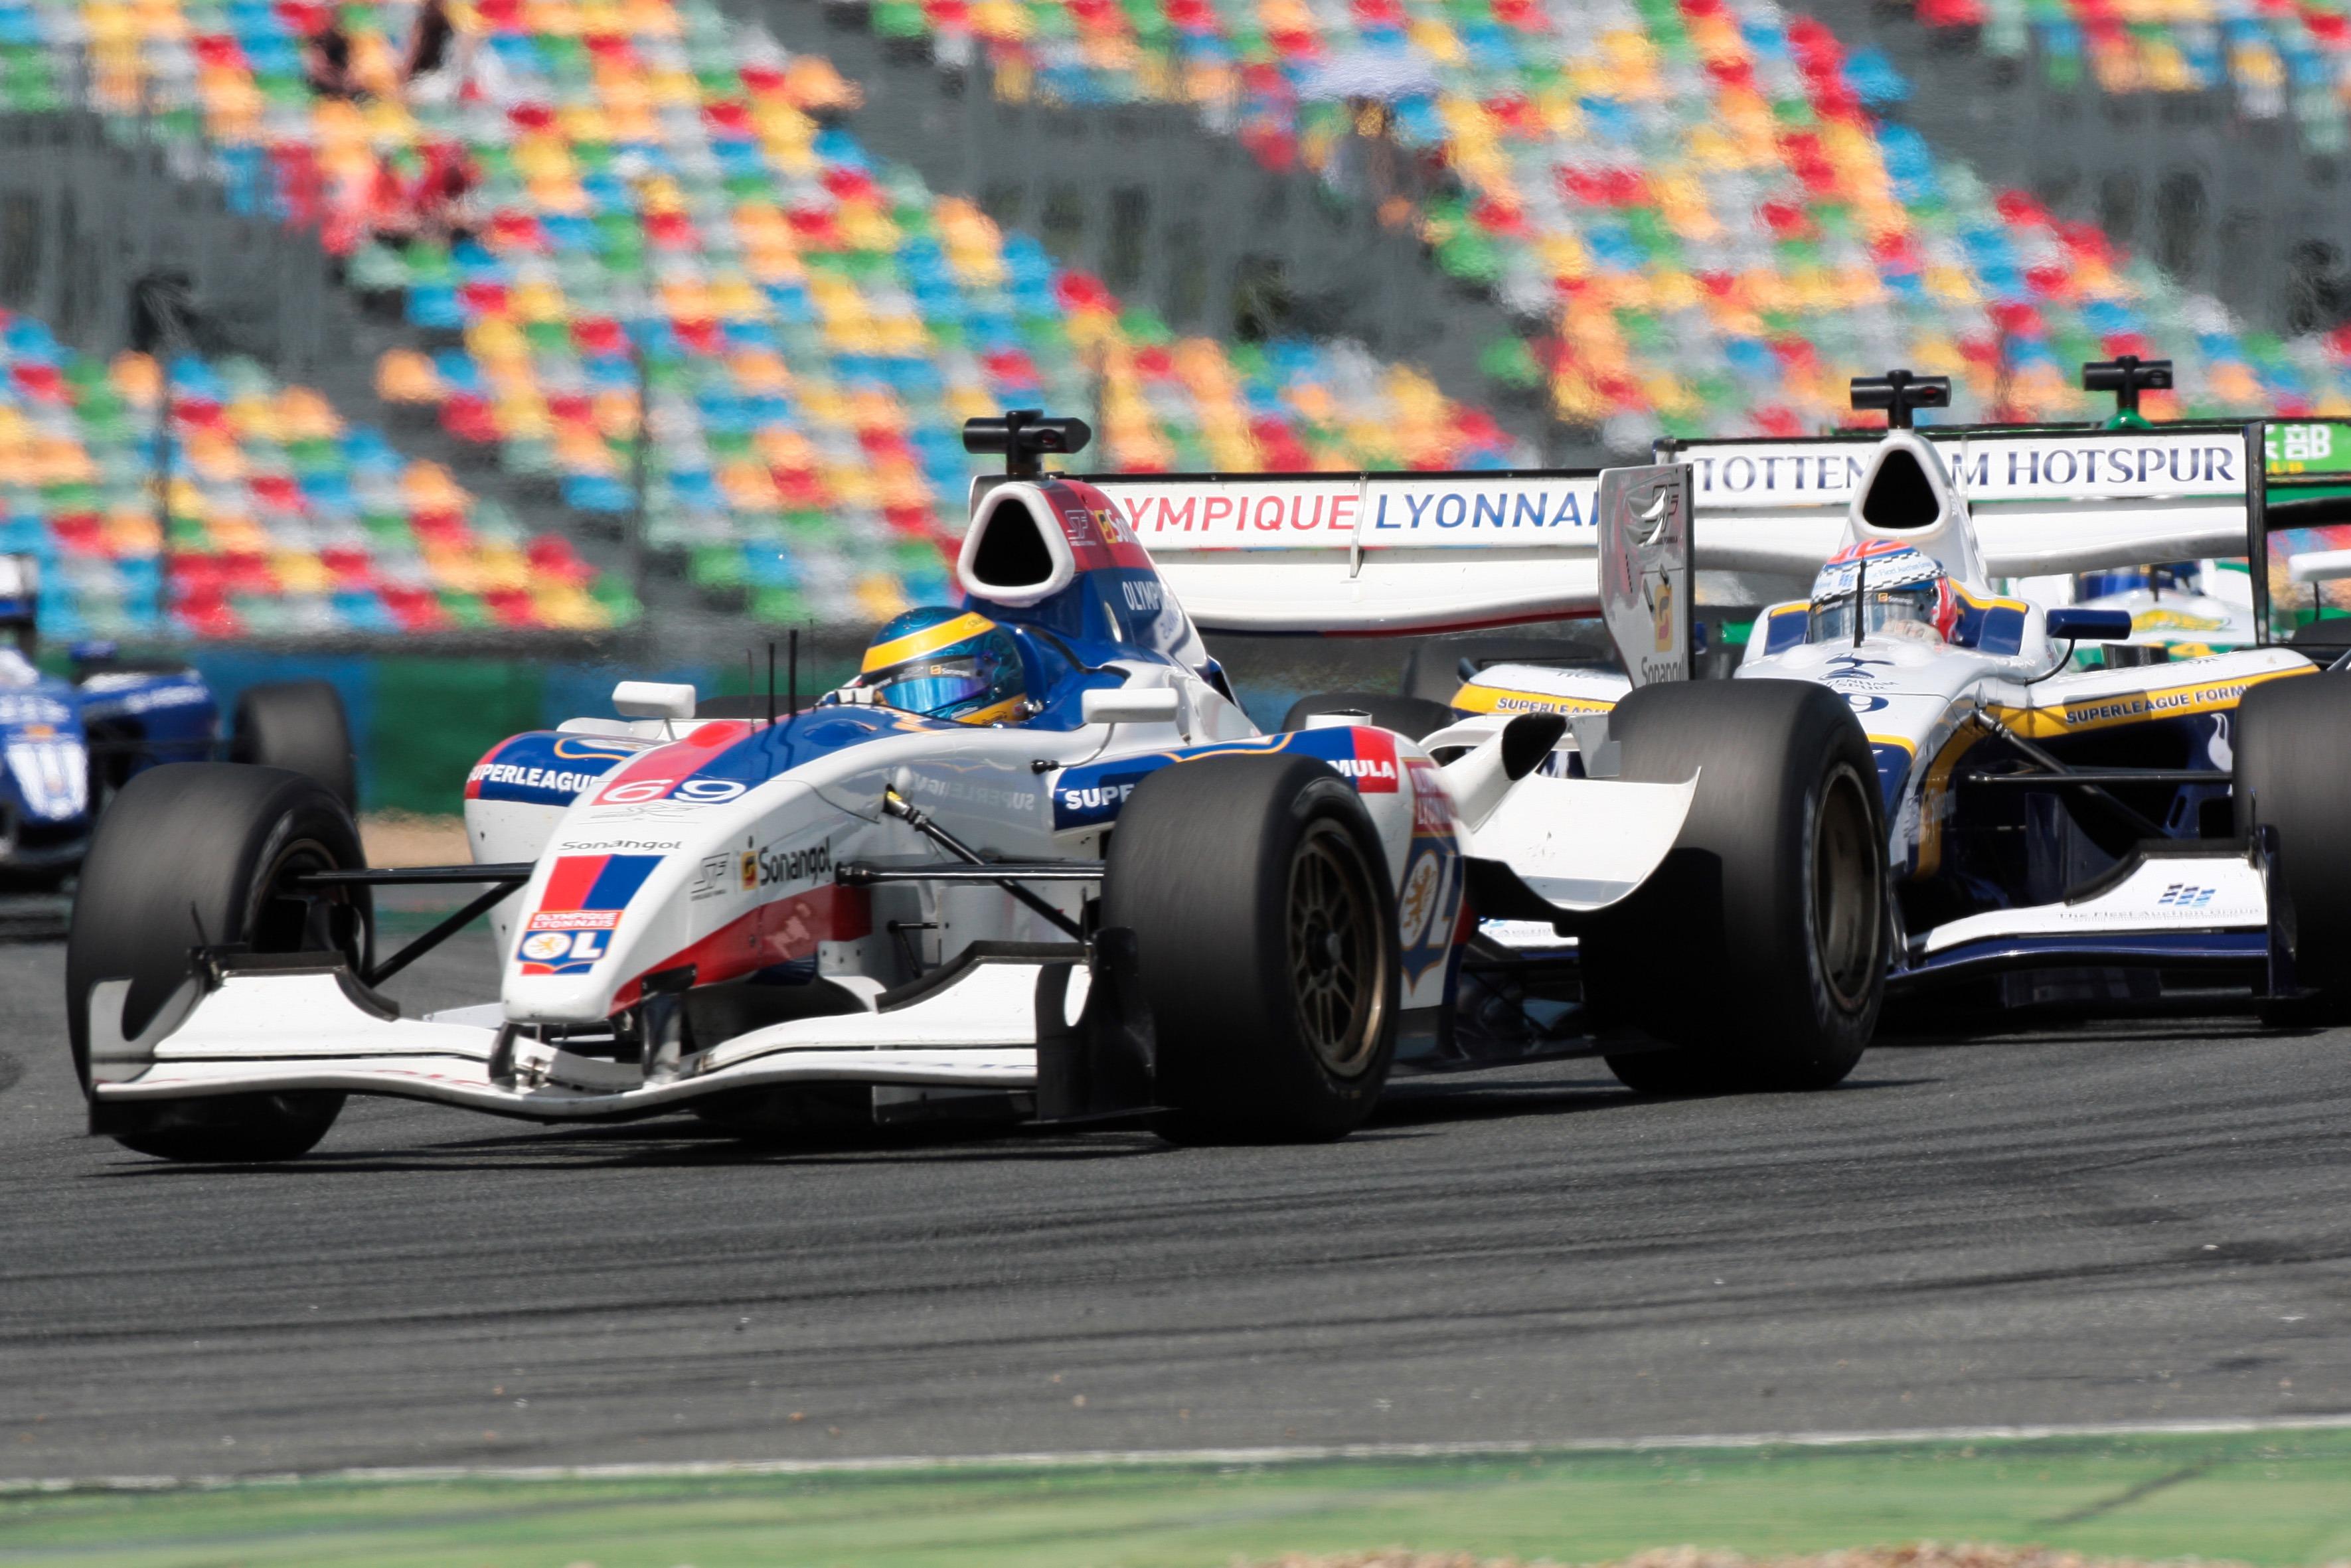 Sebastien Bourdais 2010 Superleague Formula Magny-Cours